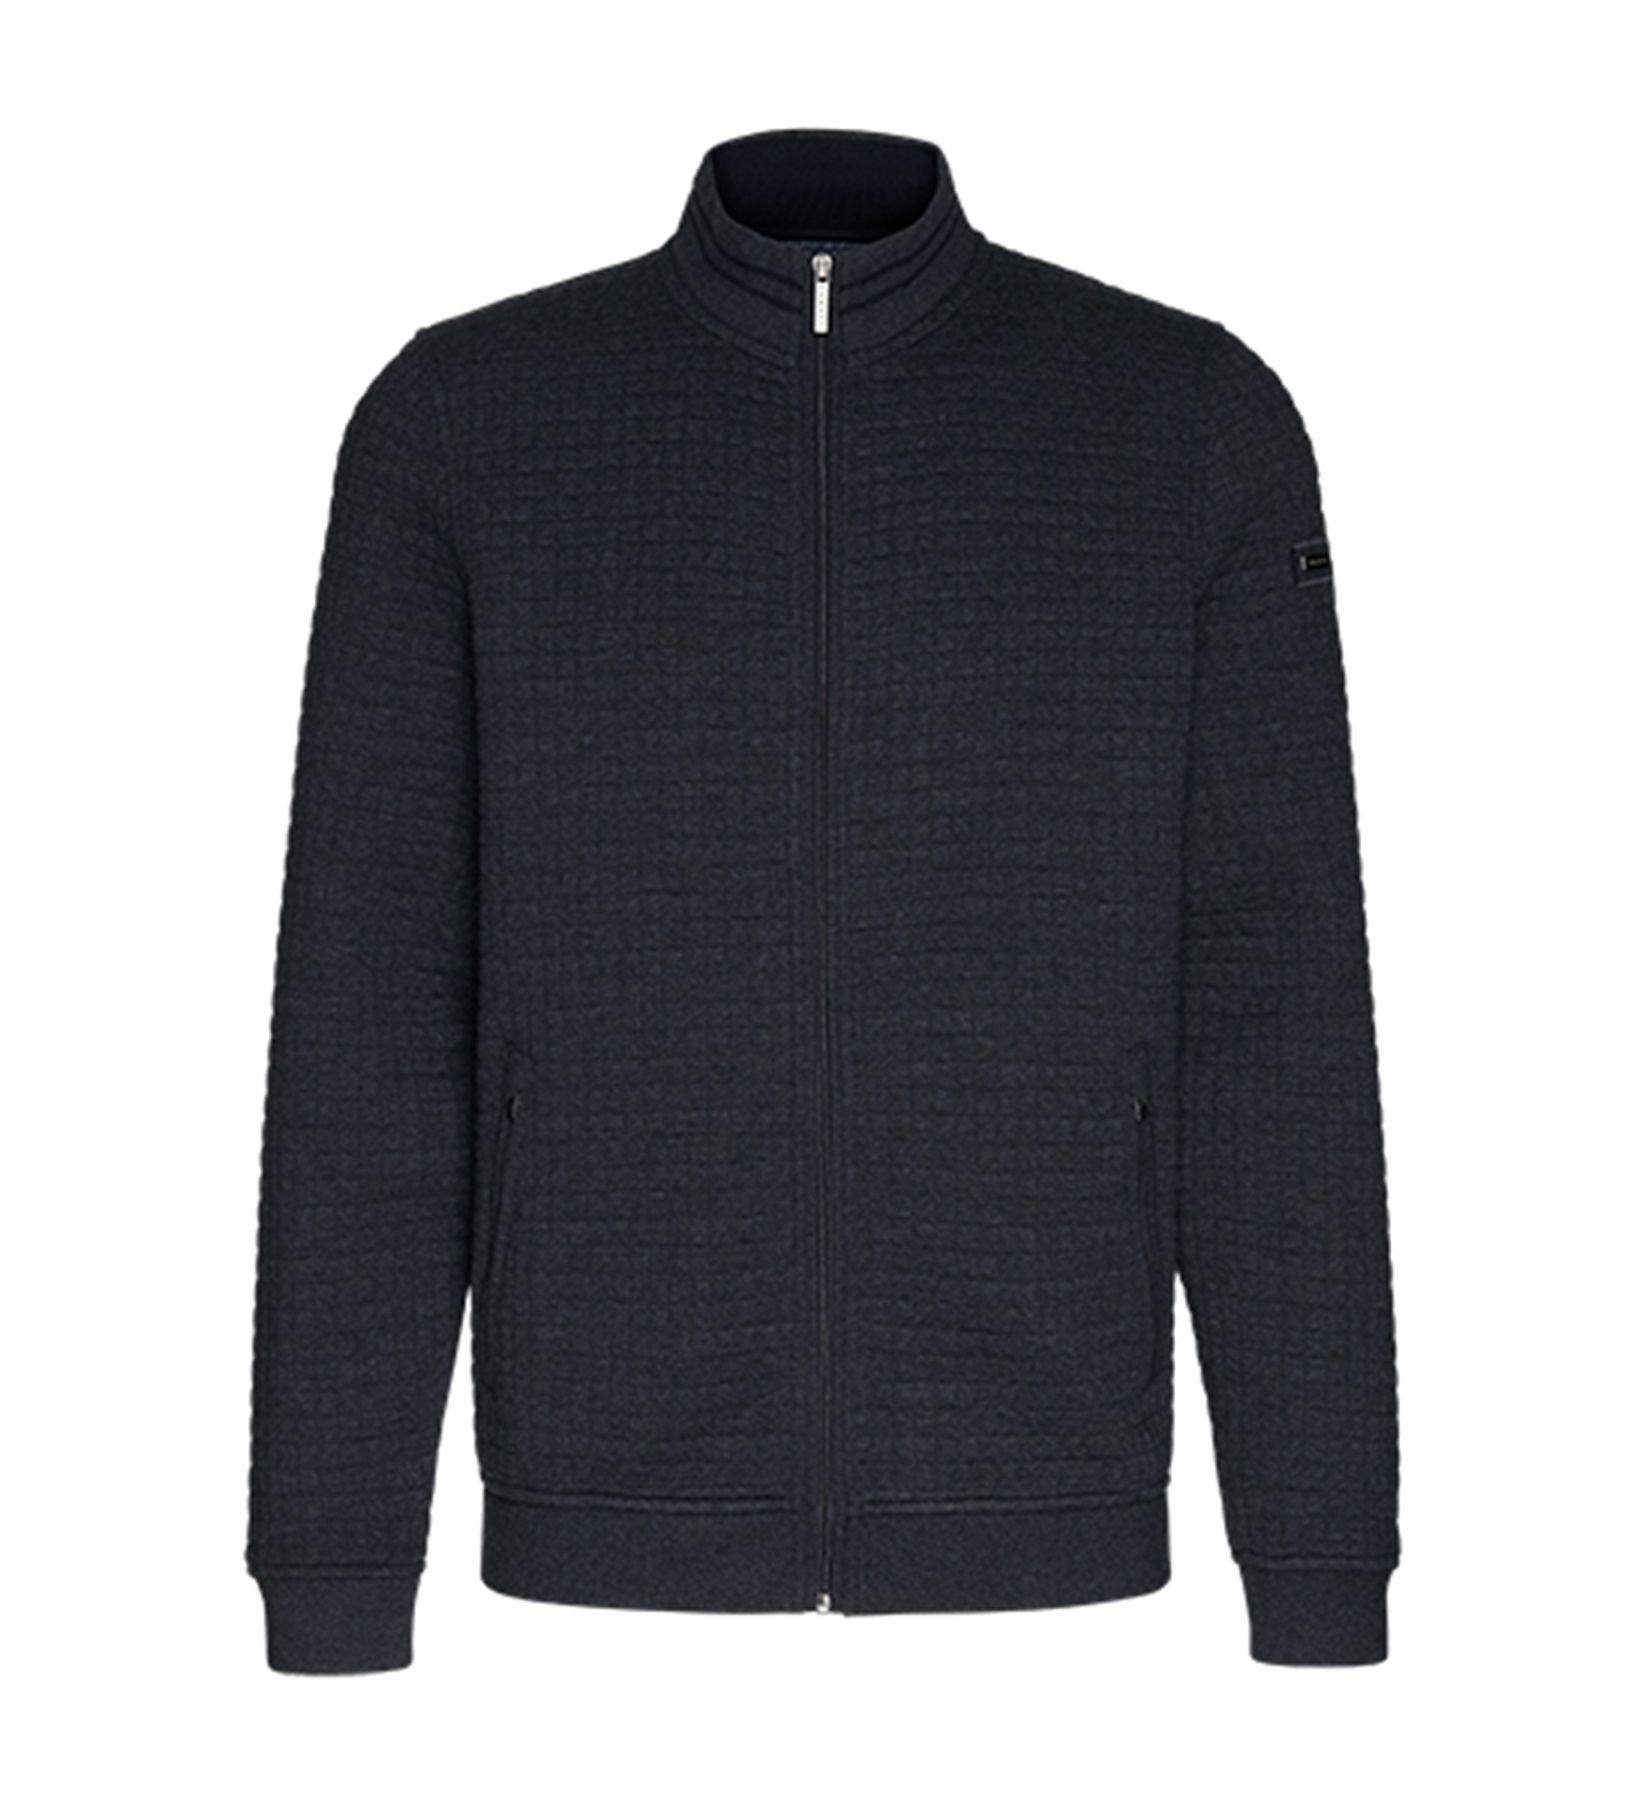 Bugatti - Herren Sweatshirt Jacke in Waffeloptik  (Art. Nr.: 25081-8750)